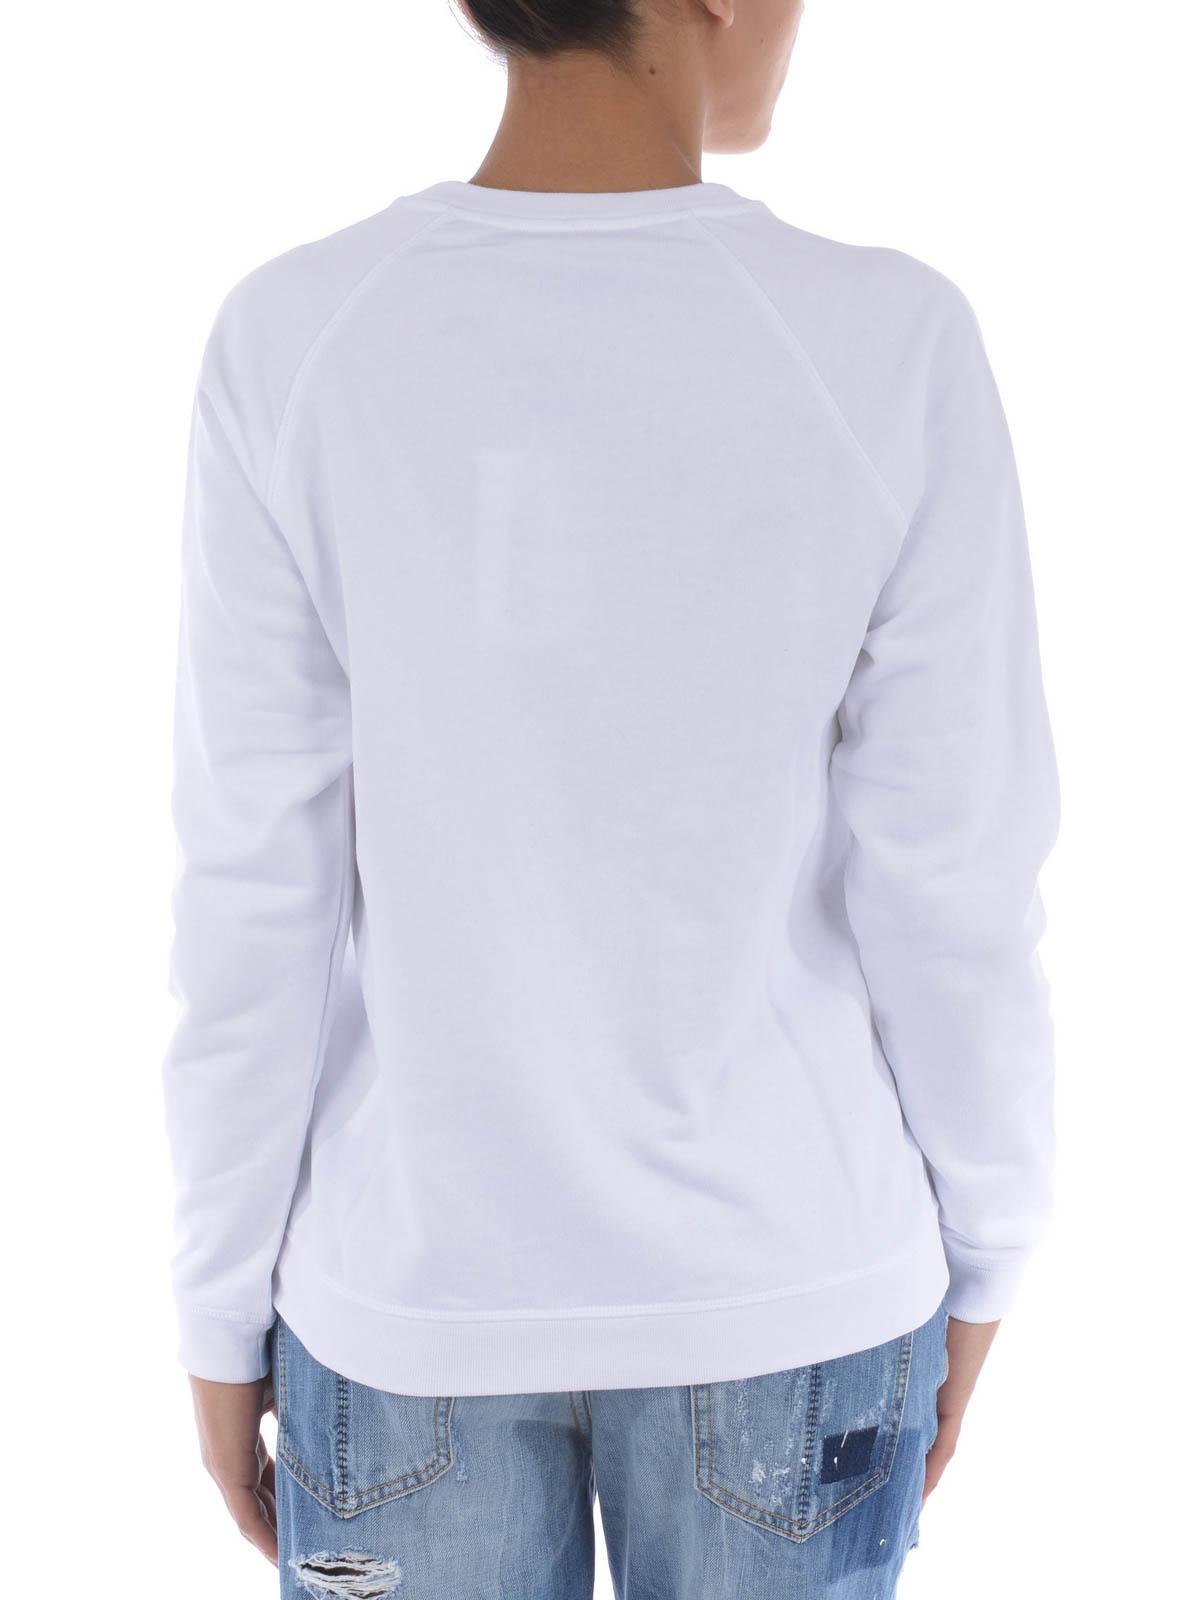 Kenzo Women'S Tiger Sweatshirt Sale - English Sweater Vest